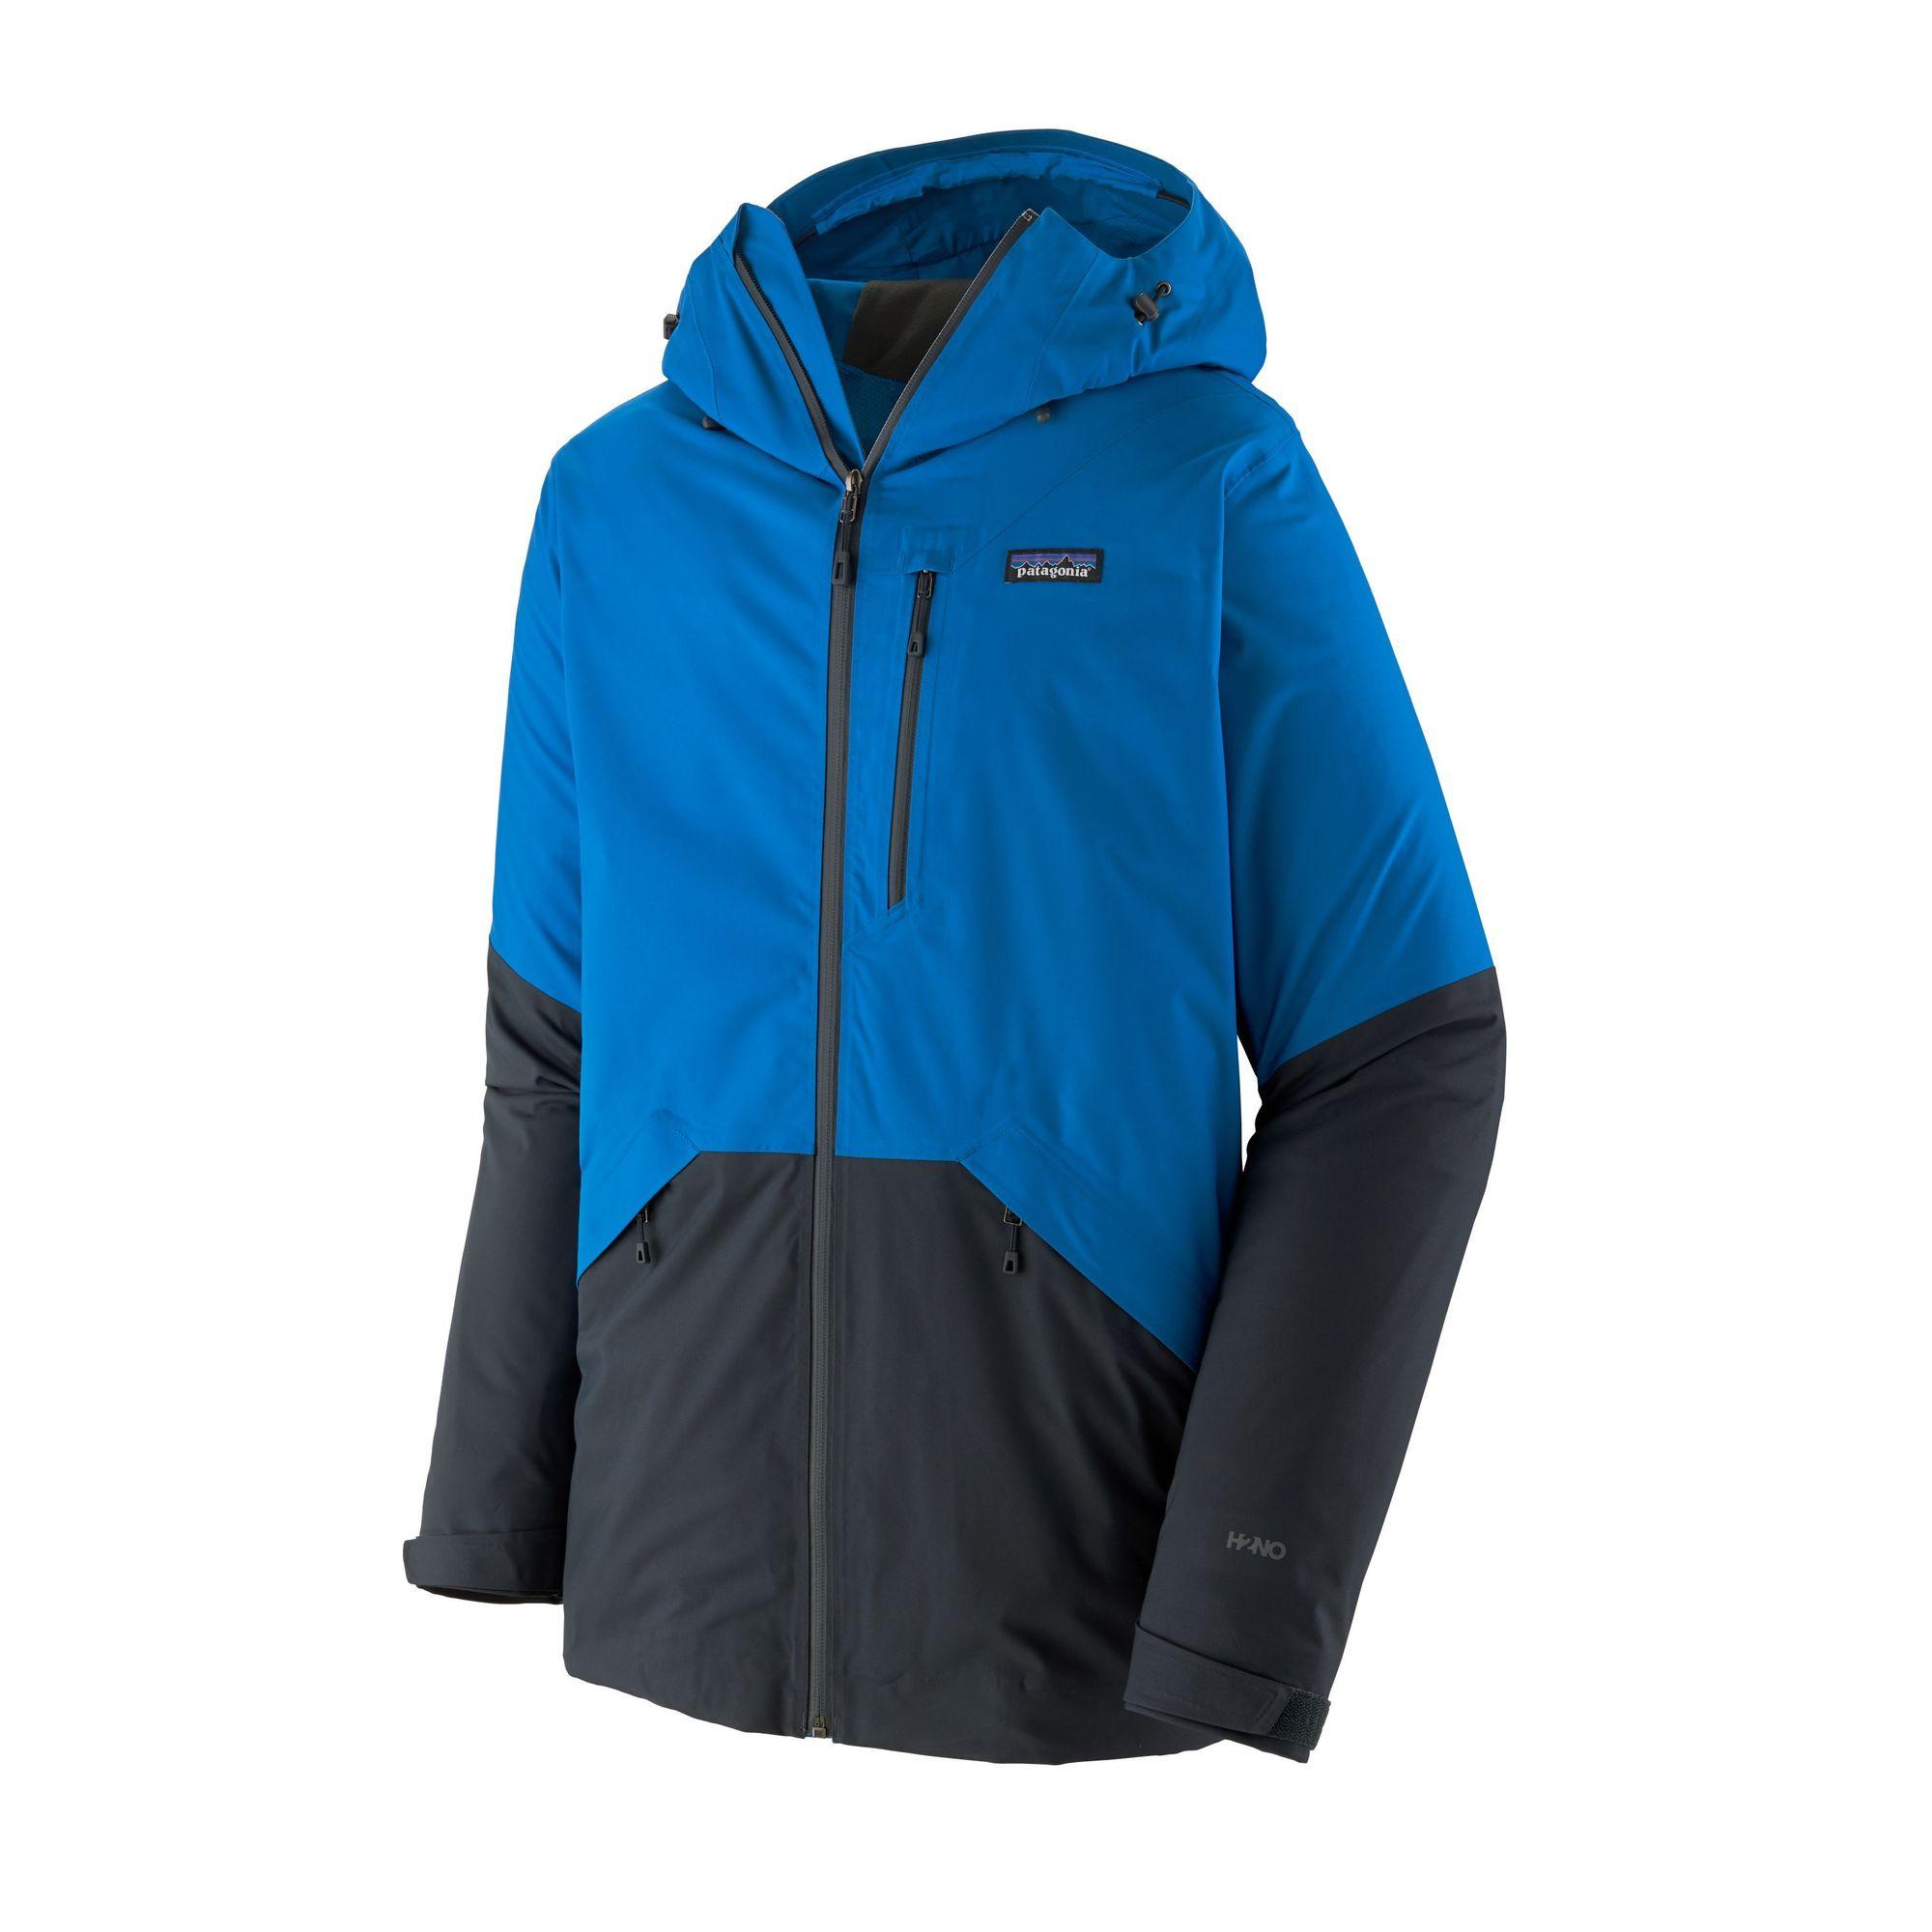 Patagonia Snowshot Jacket - Veste ski homme